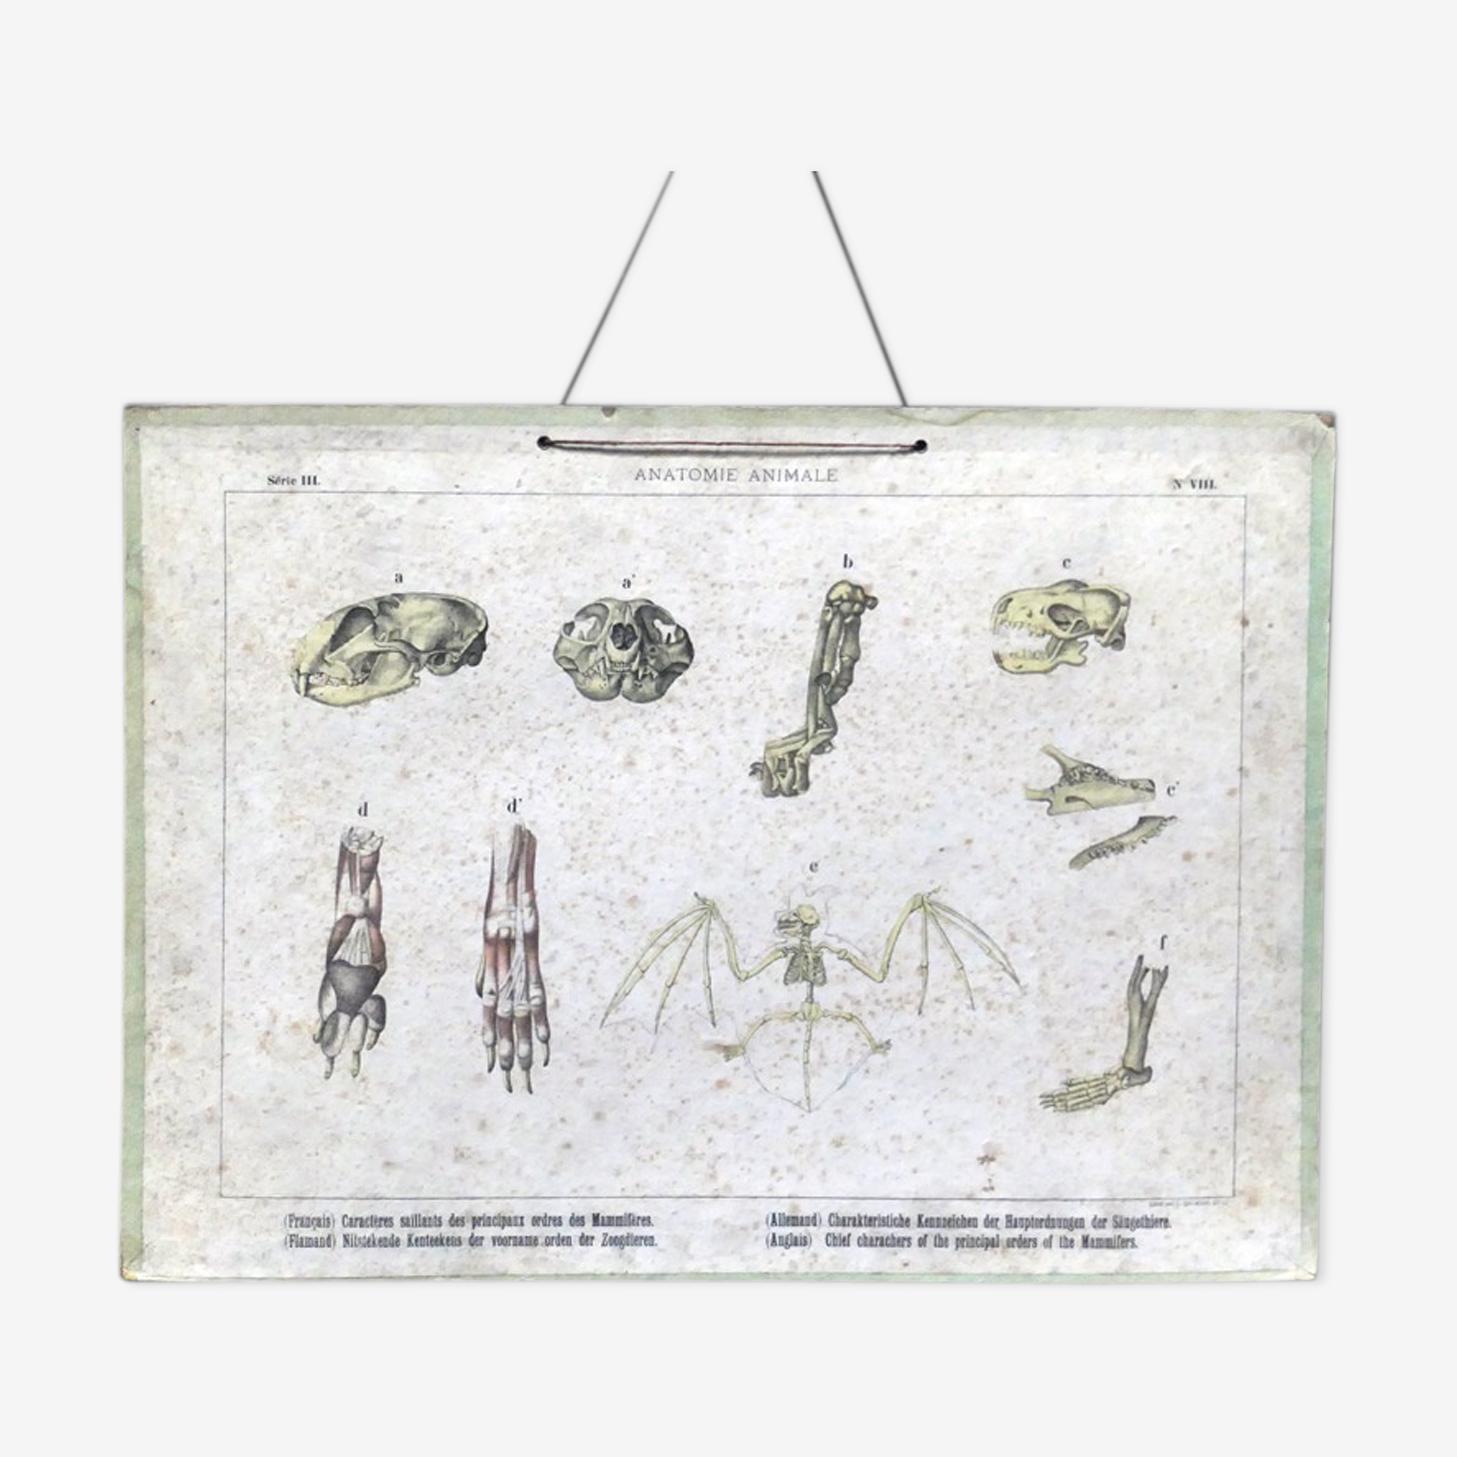 Old anatomical poster of vertebrates